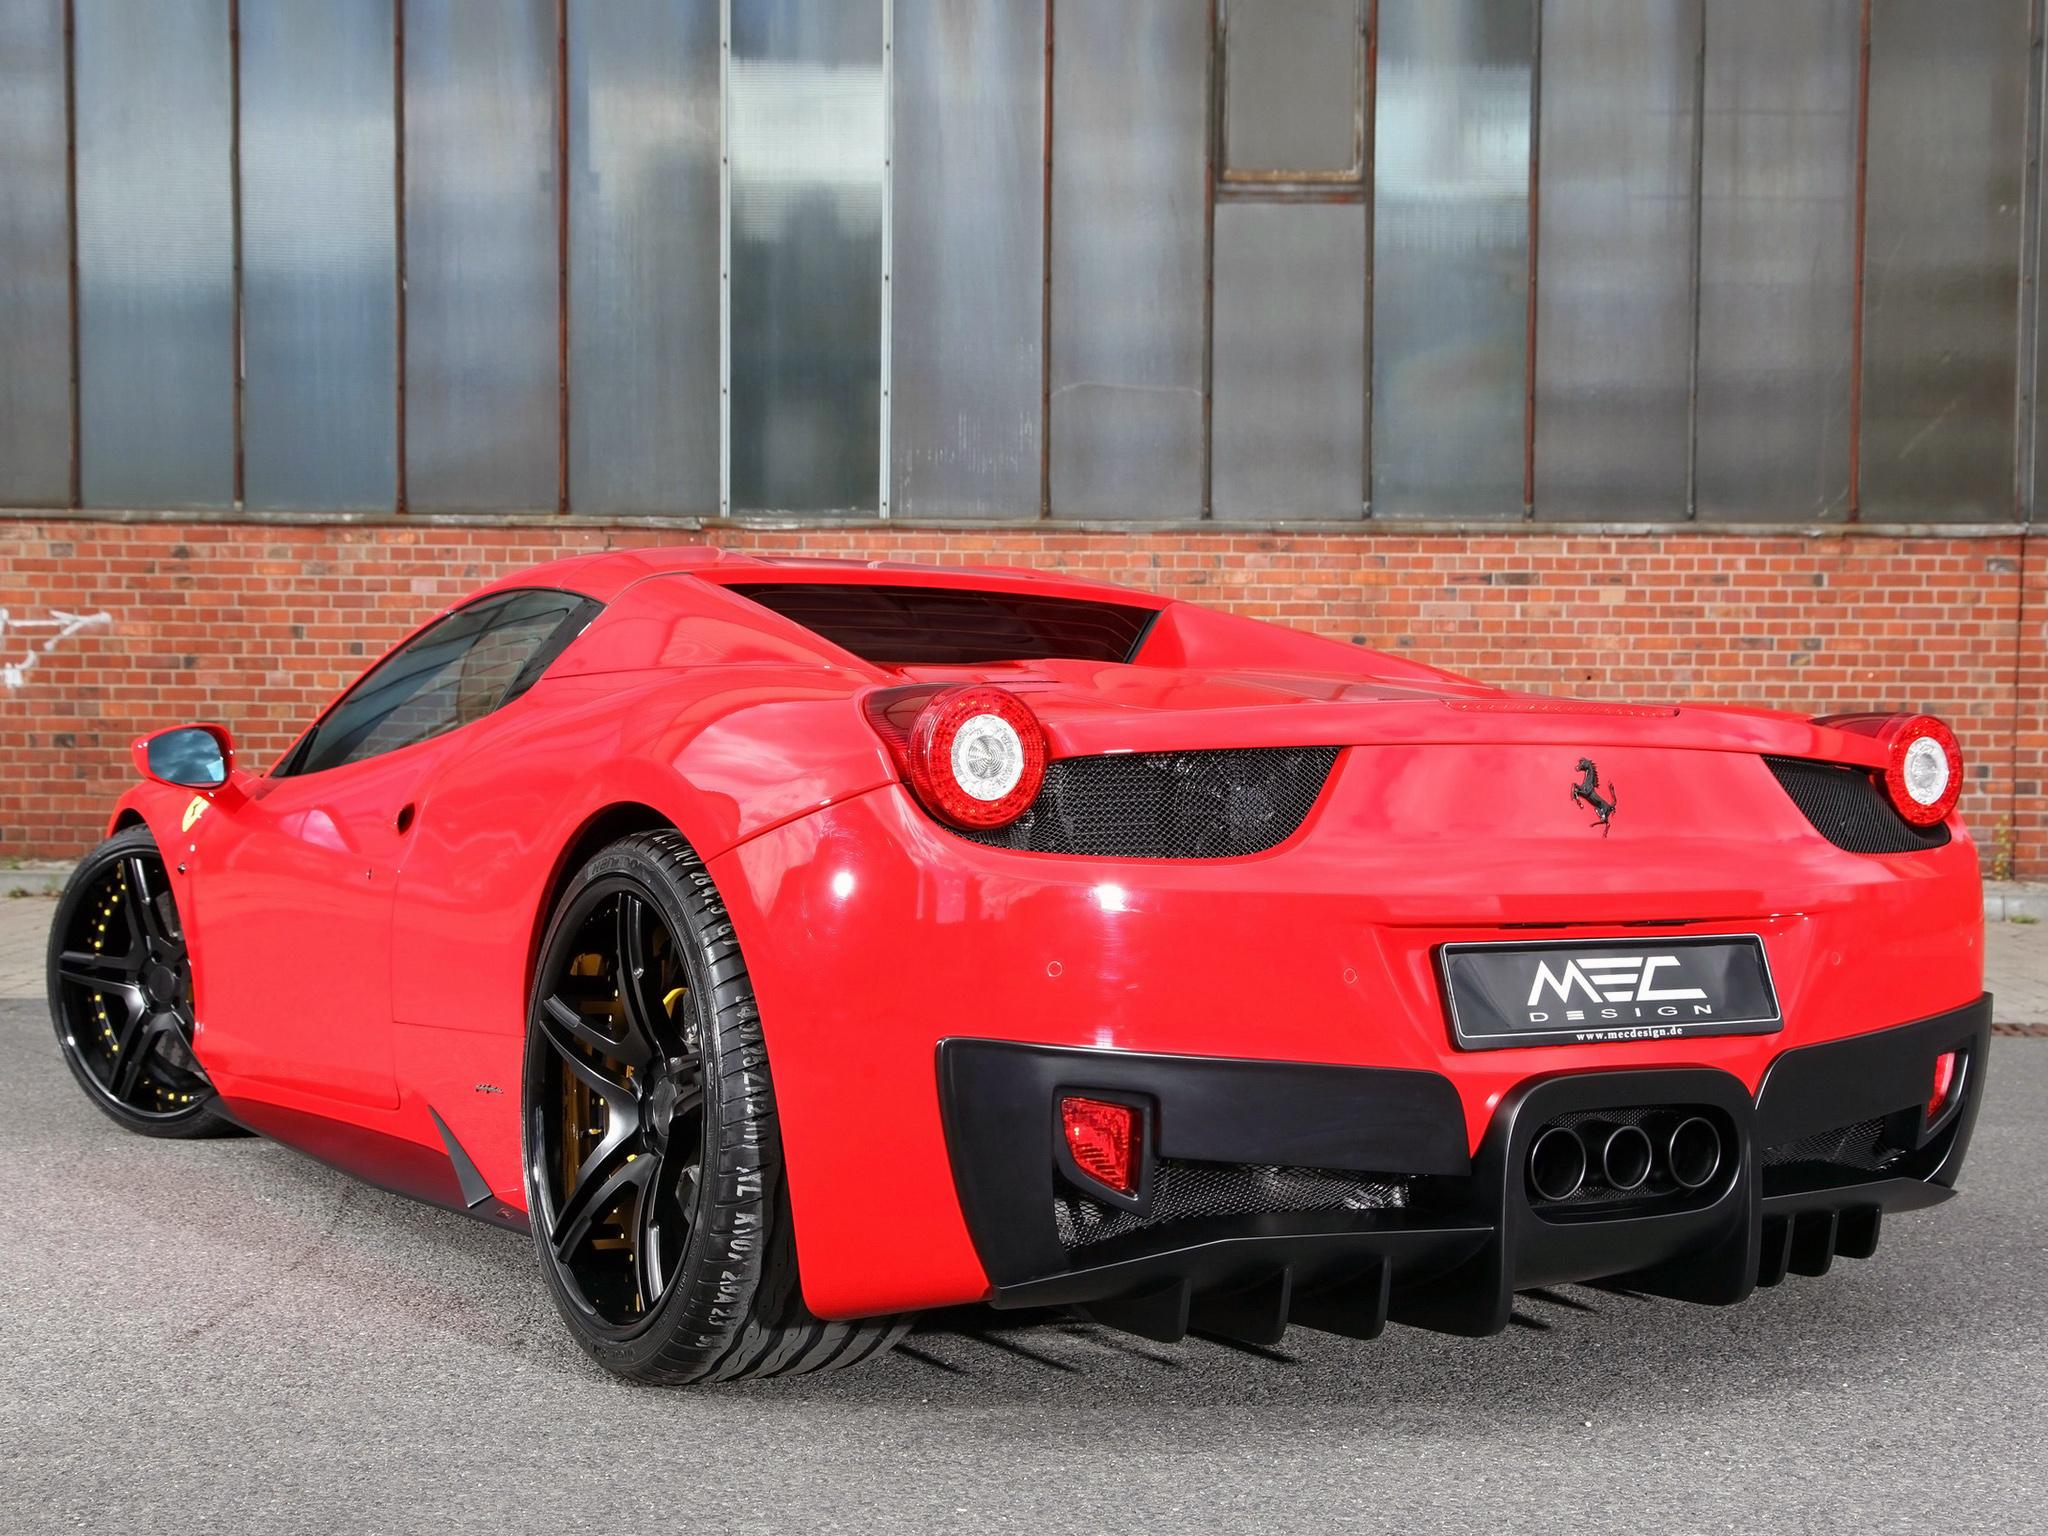 2014 MEC Design Ferrari 458 Spider Full HD Wallpaper And Background